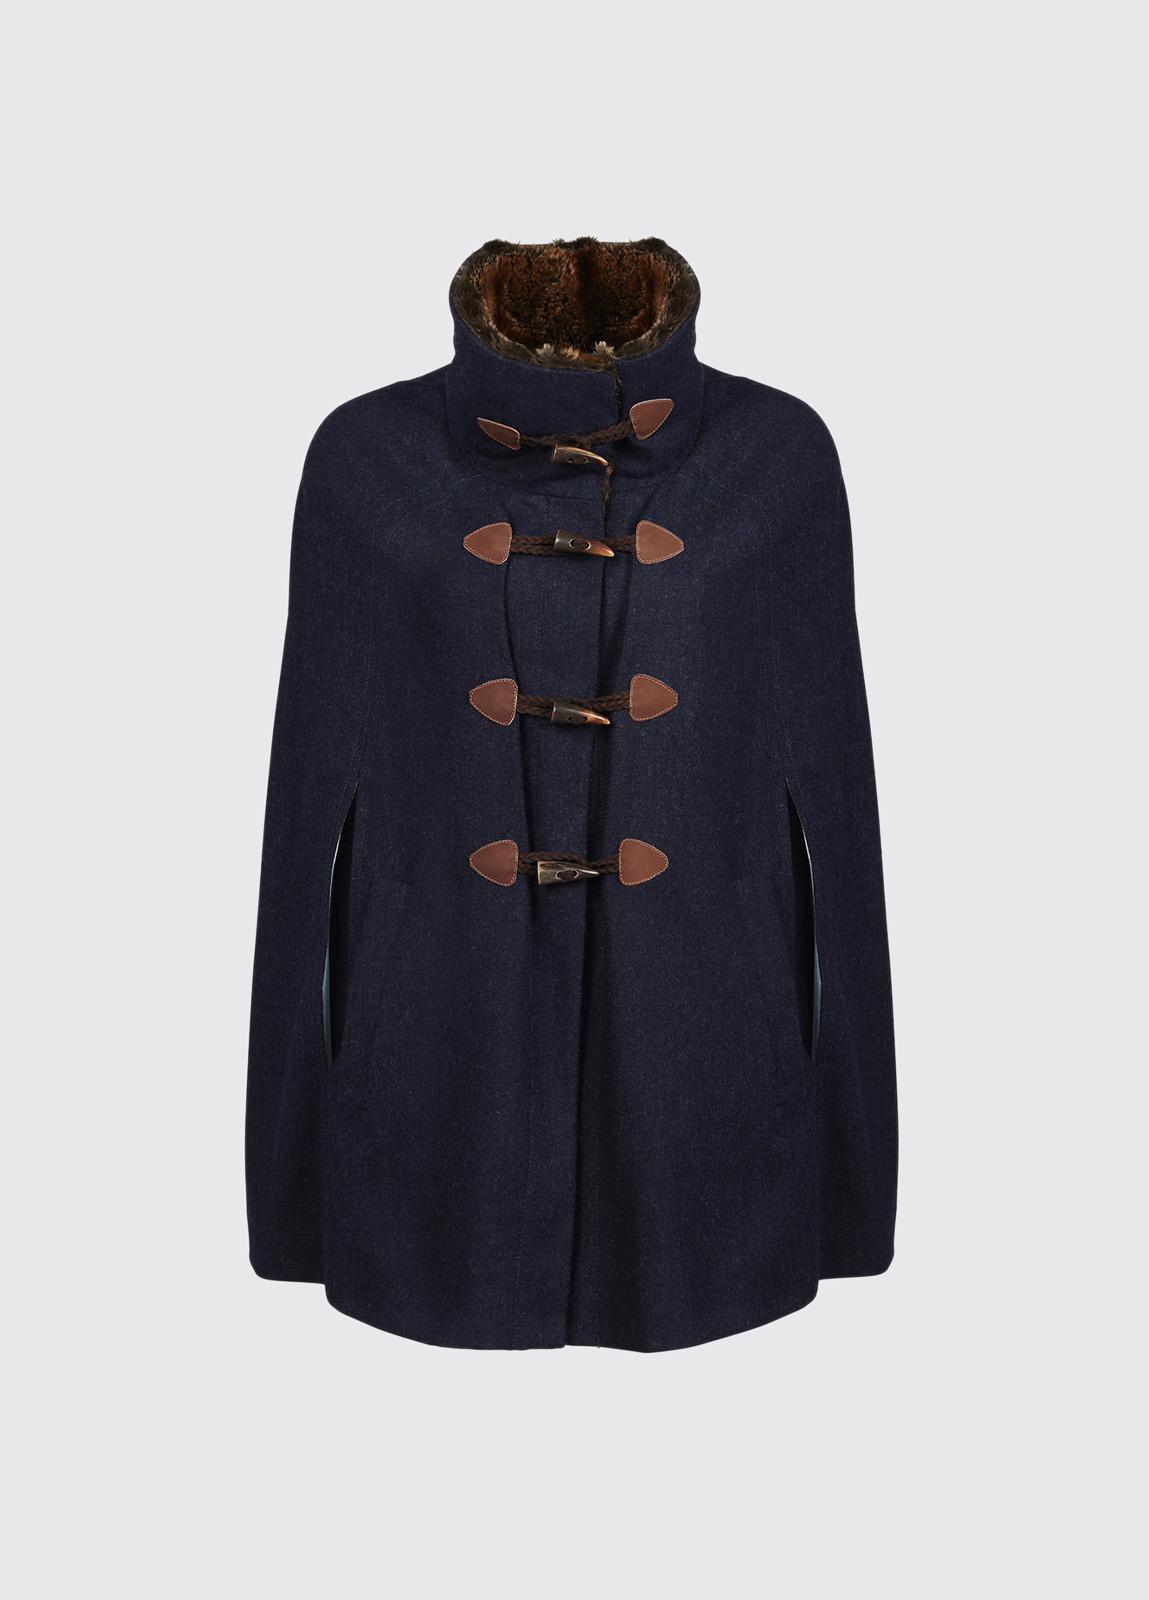 Samphire Tweed Cape - Navy